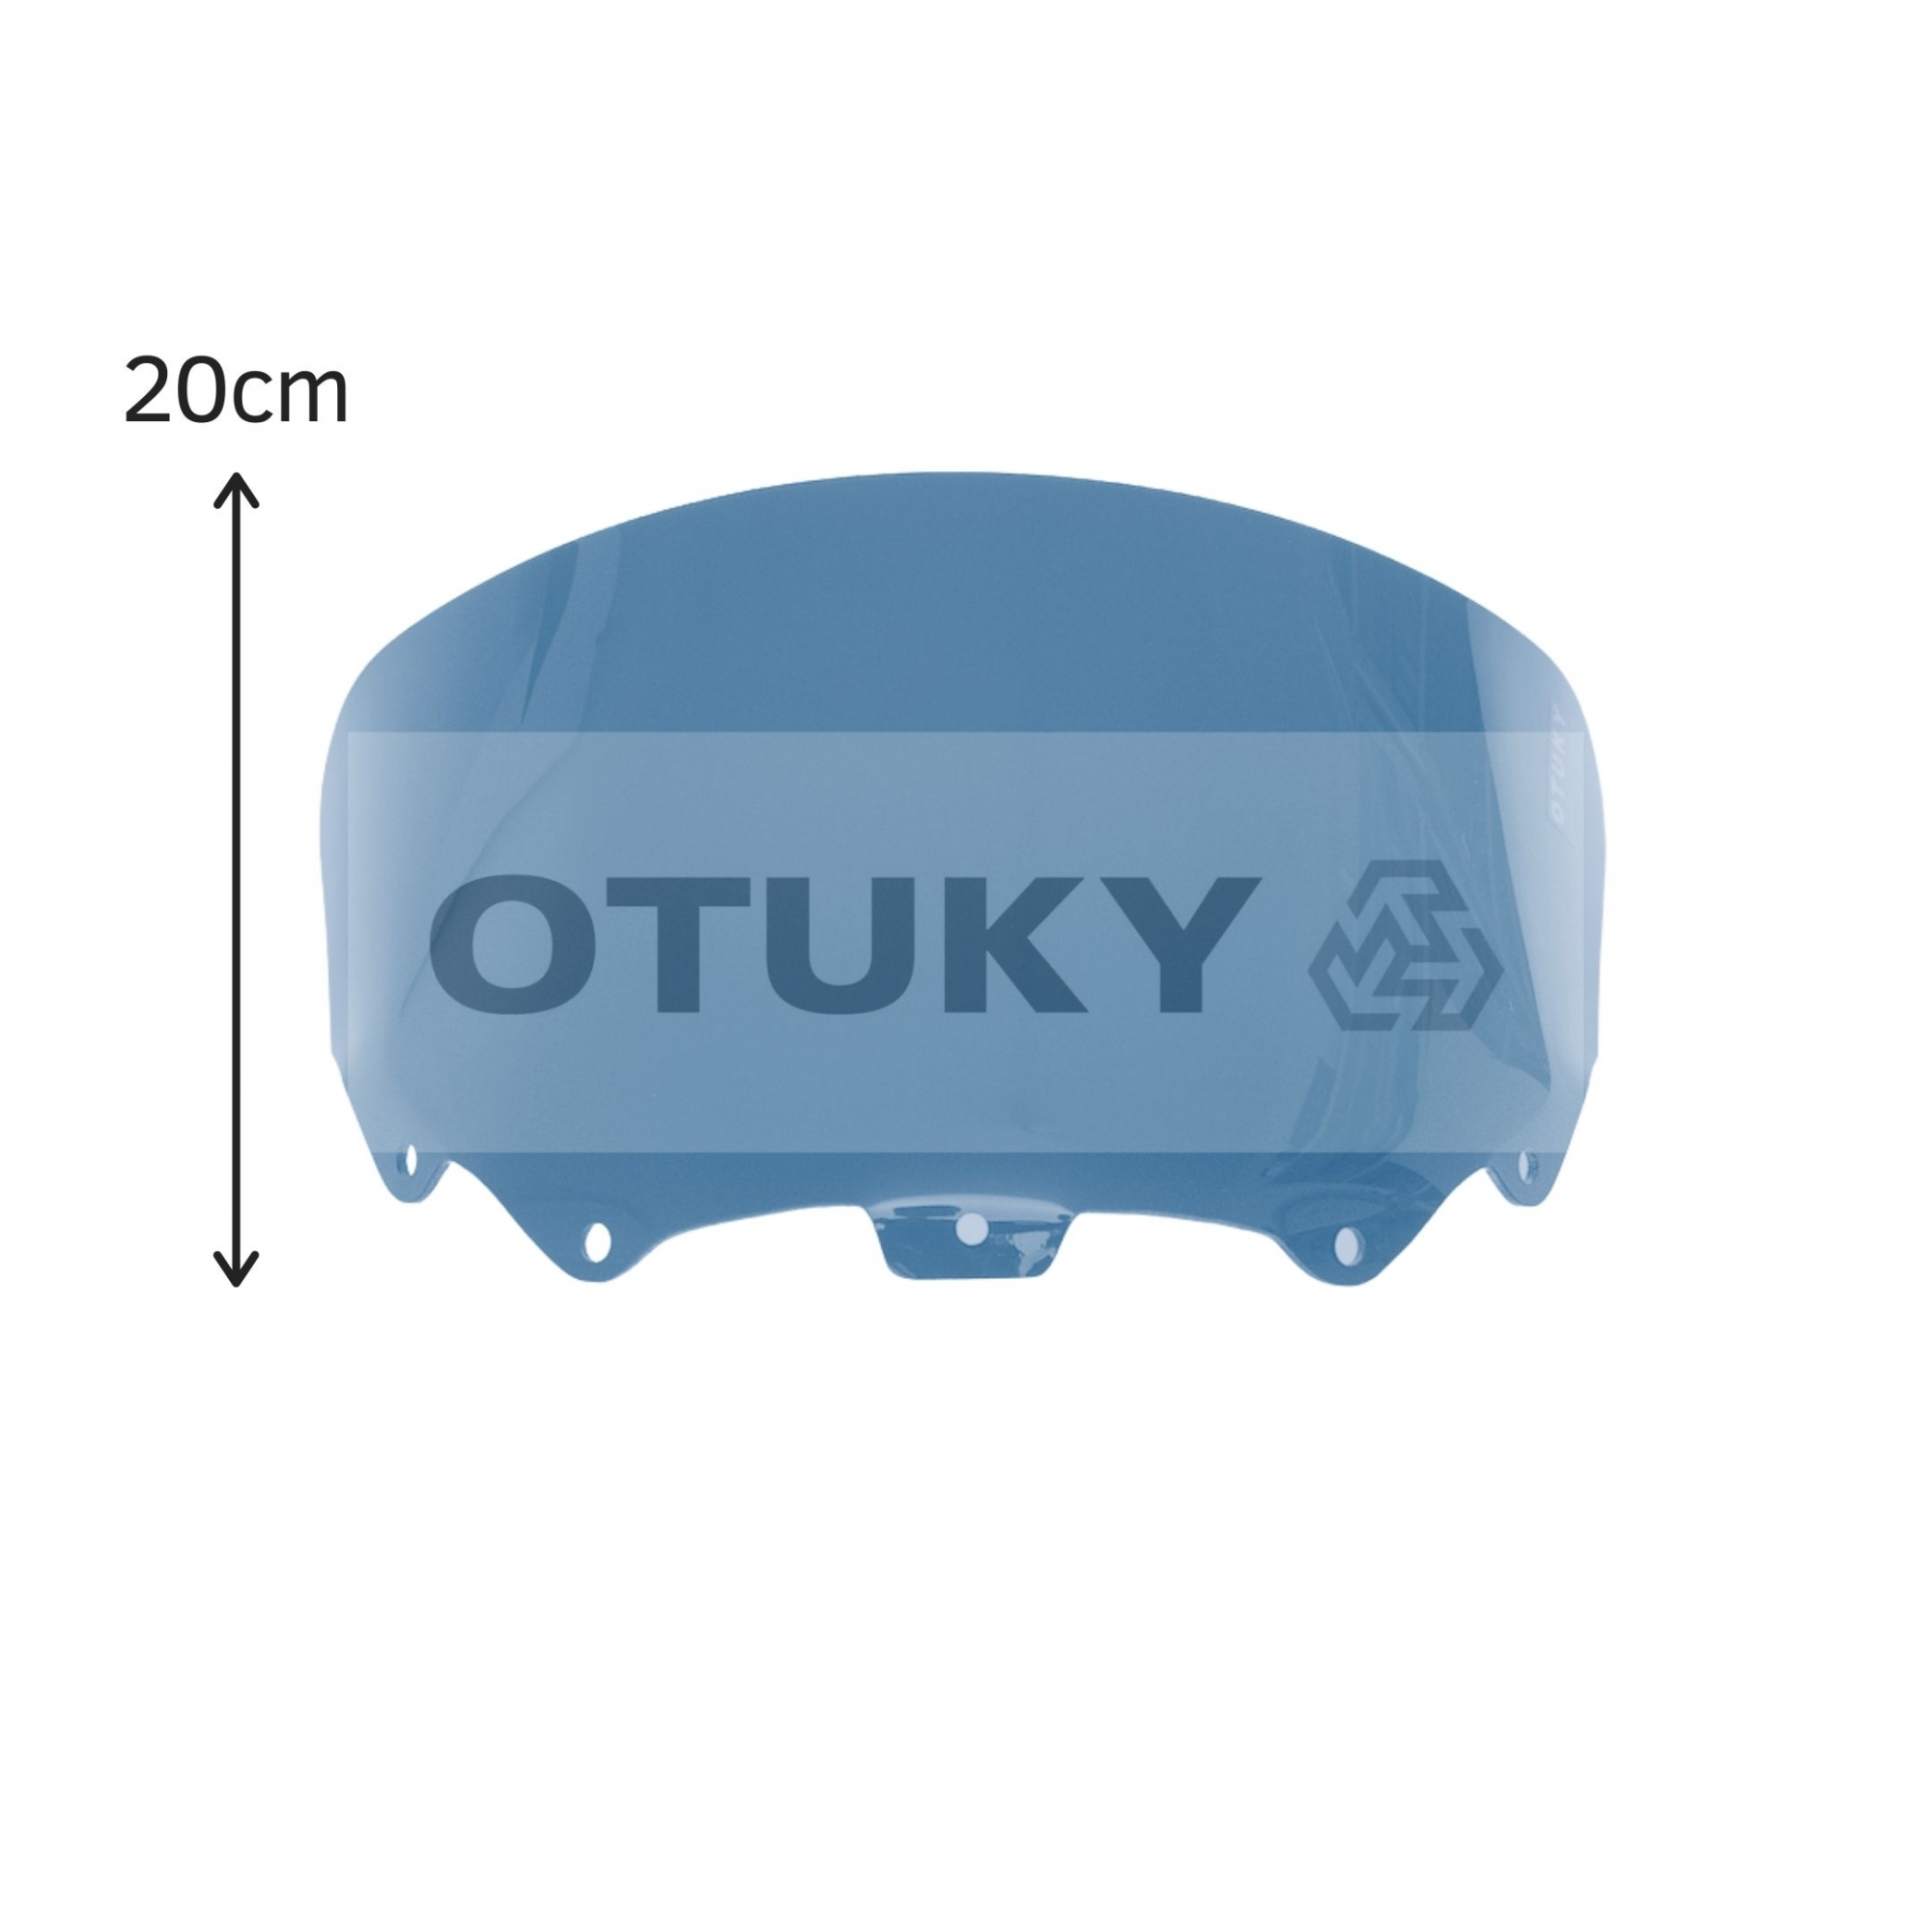 Bolha para Moto Citycom 300i Otuky Menor Fumê Escuro